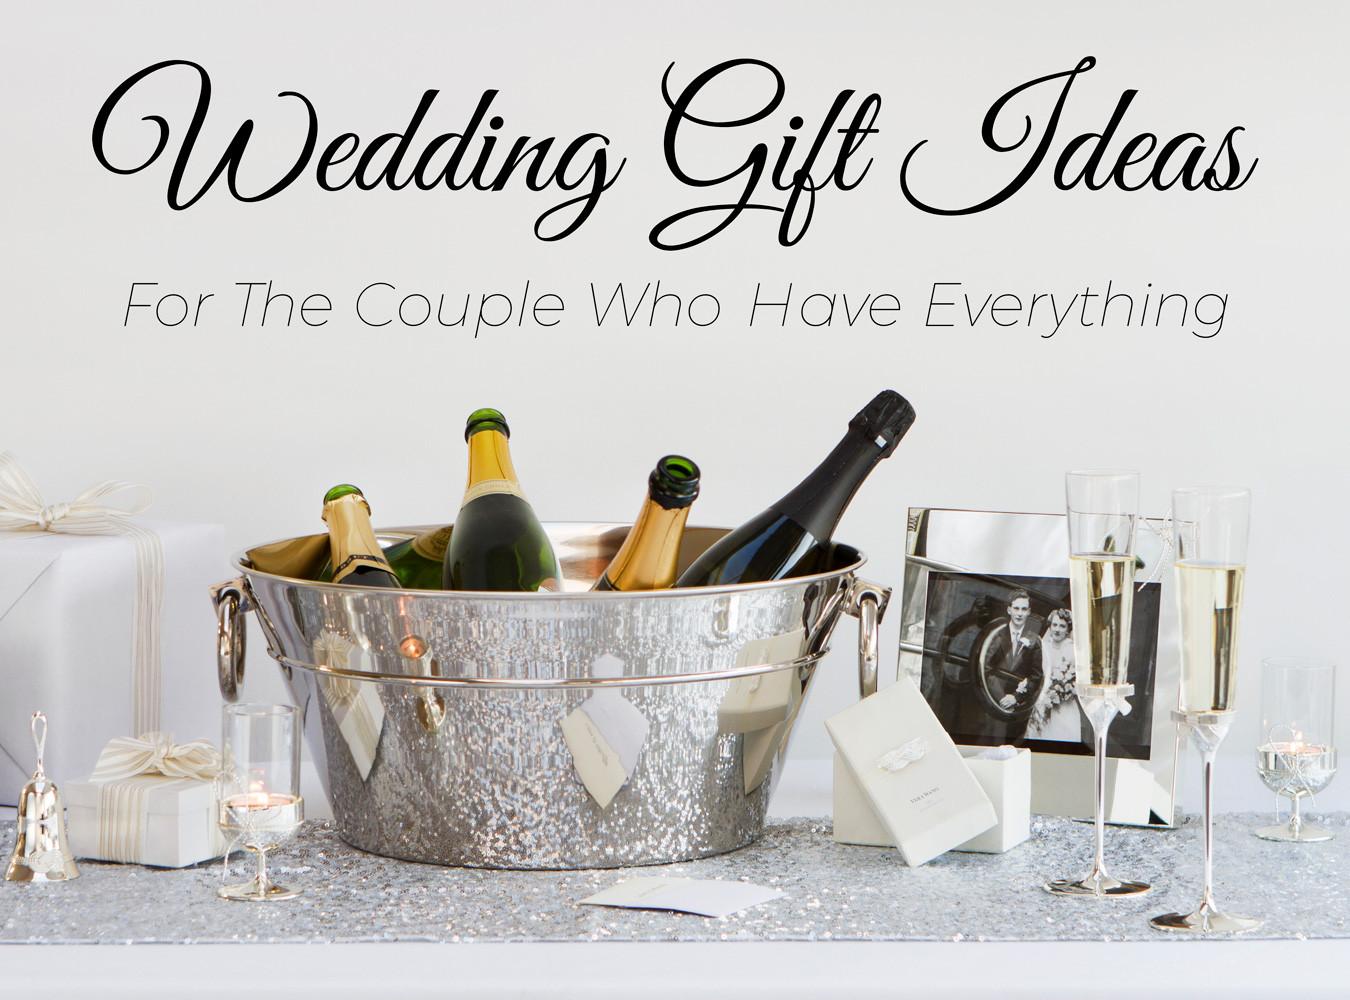 Wedding Gift Ideas For The Couple  5 Wedding Gift Ideas for the Couple Who Have Everything